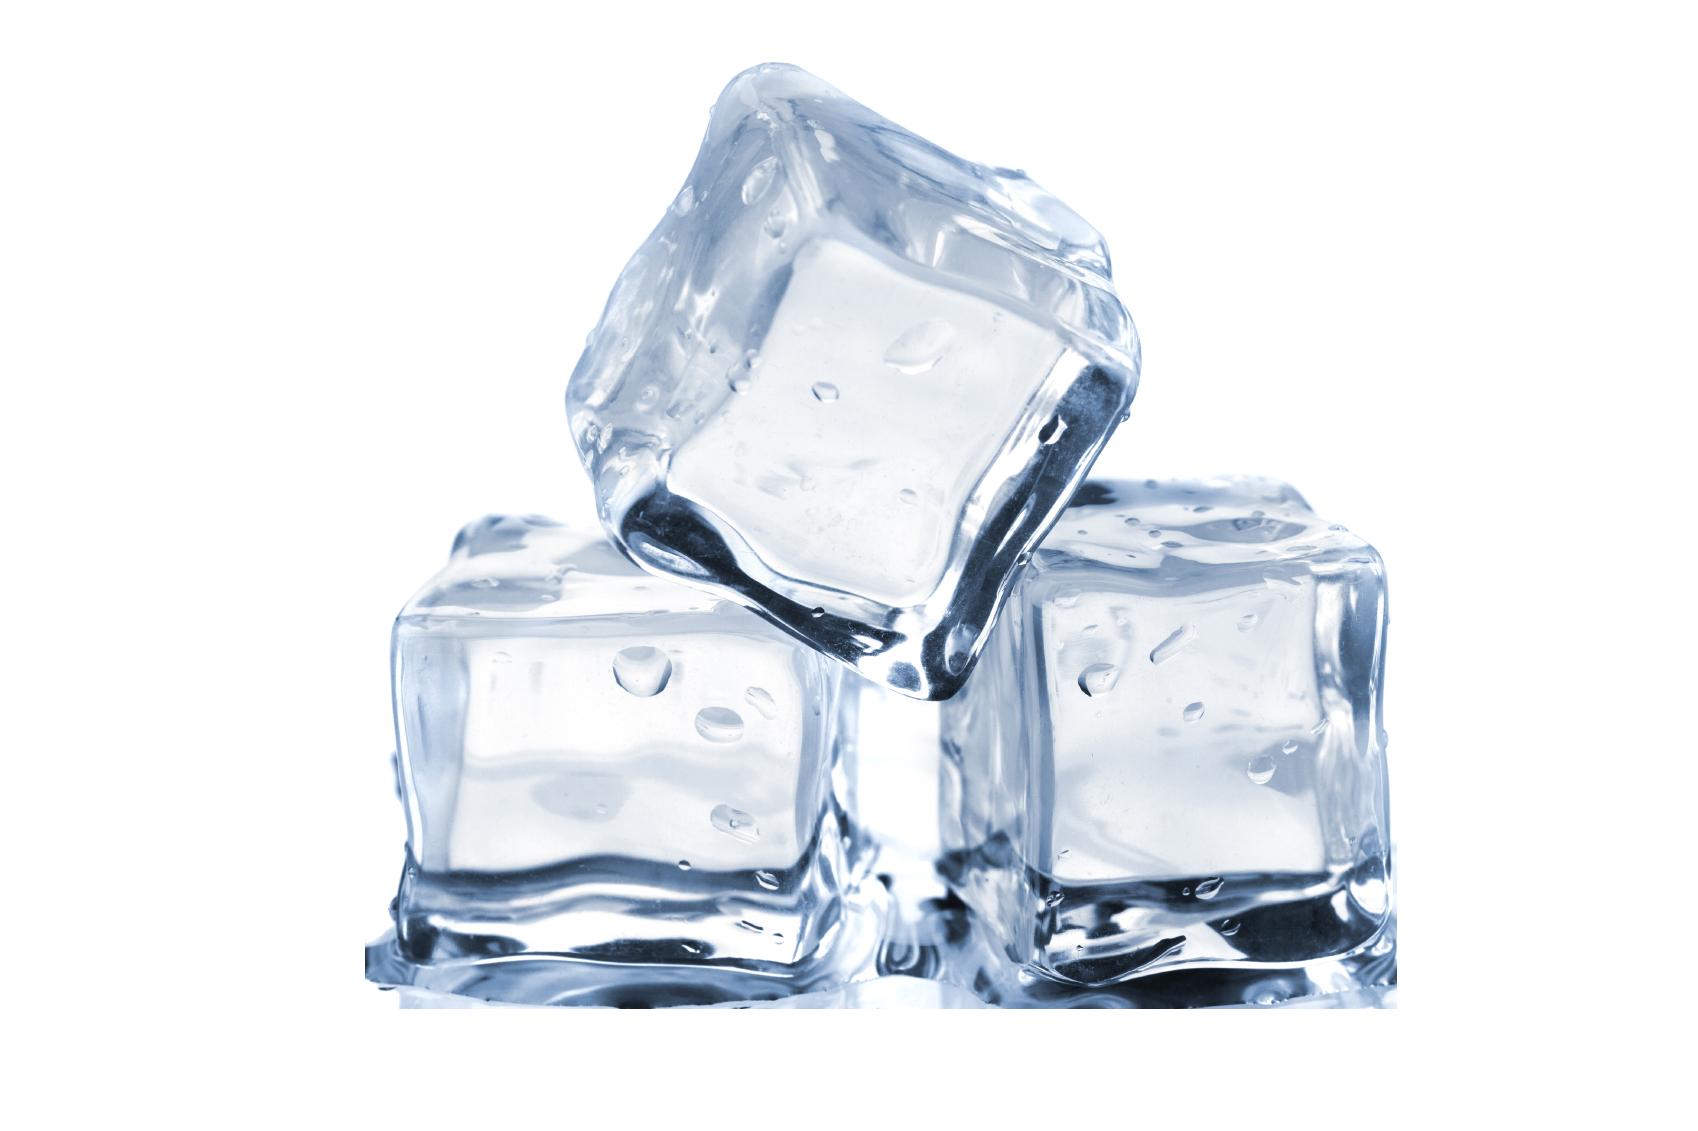 Icecube HD PNG - 119124